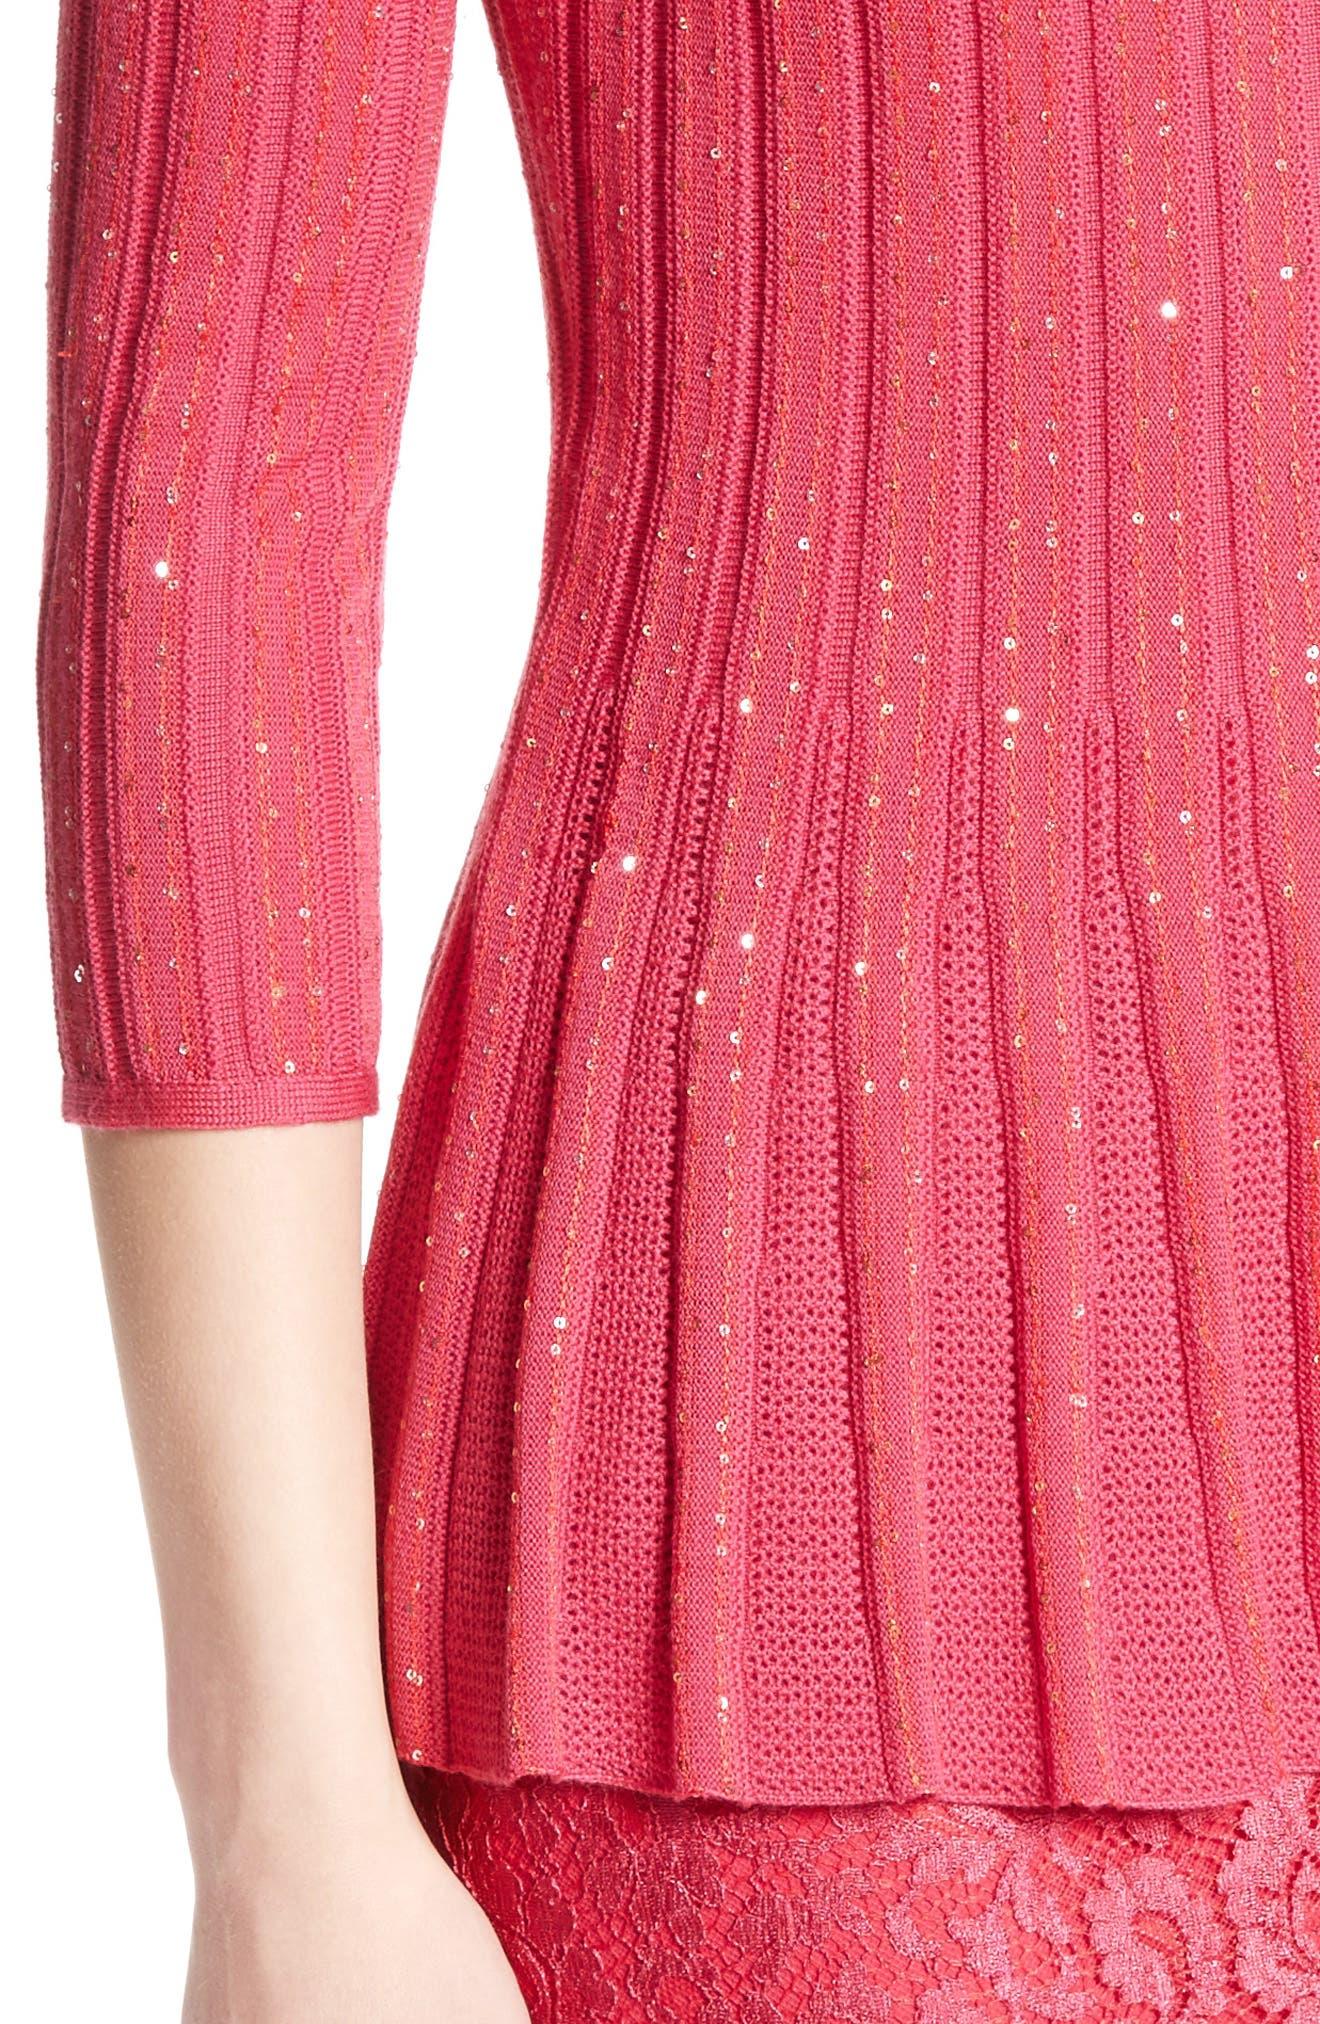 Chriag Sequin Knit Peplum Top,                             Alternate thumbnail 4, color,                             Indian Rose